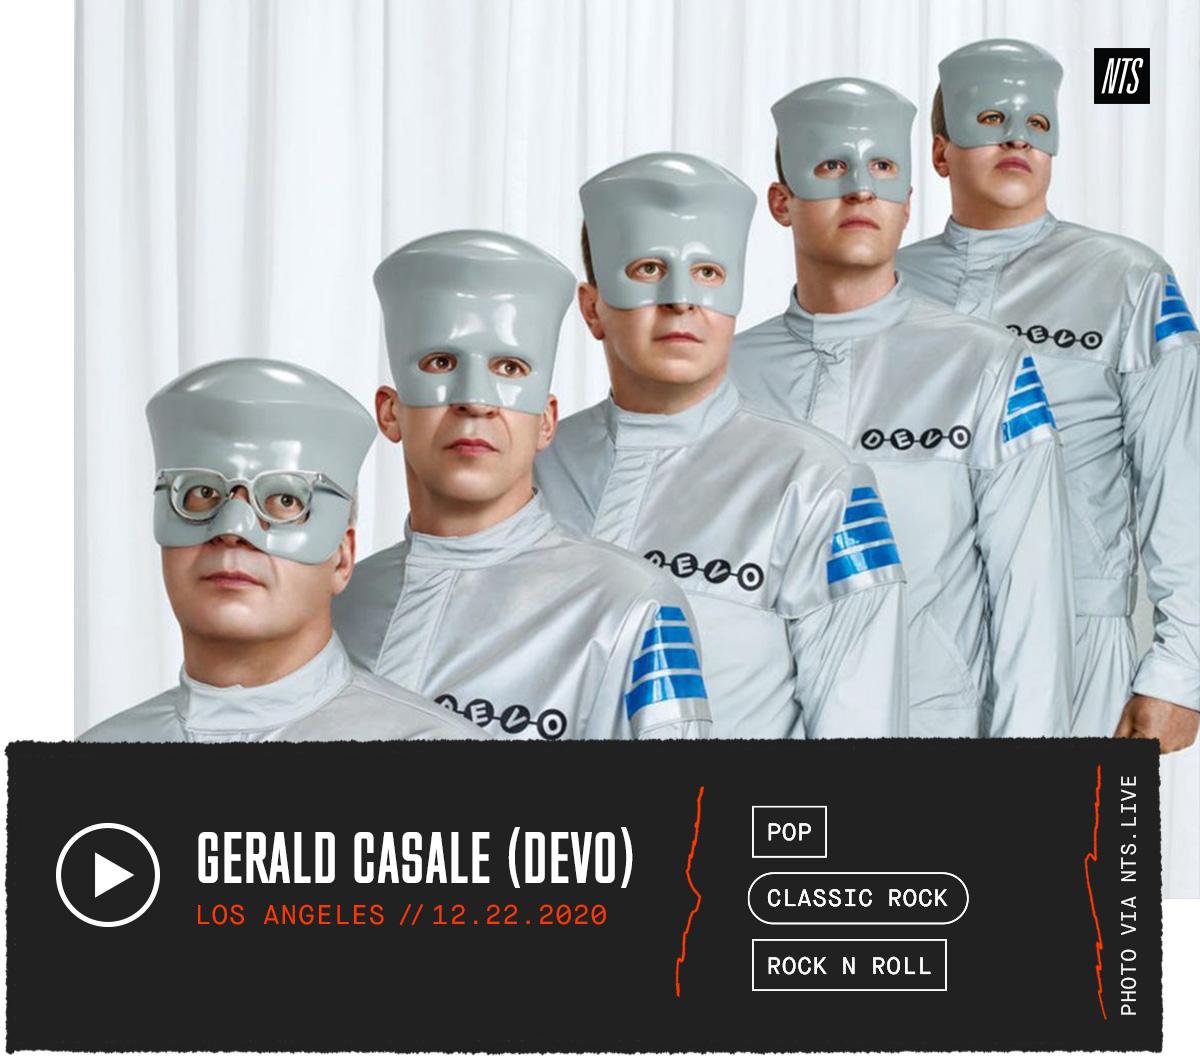 NTS Radio –GERALD CASALE (DEVO)